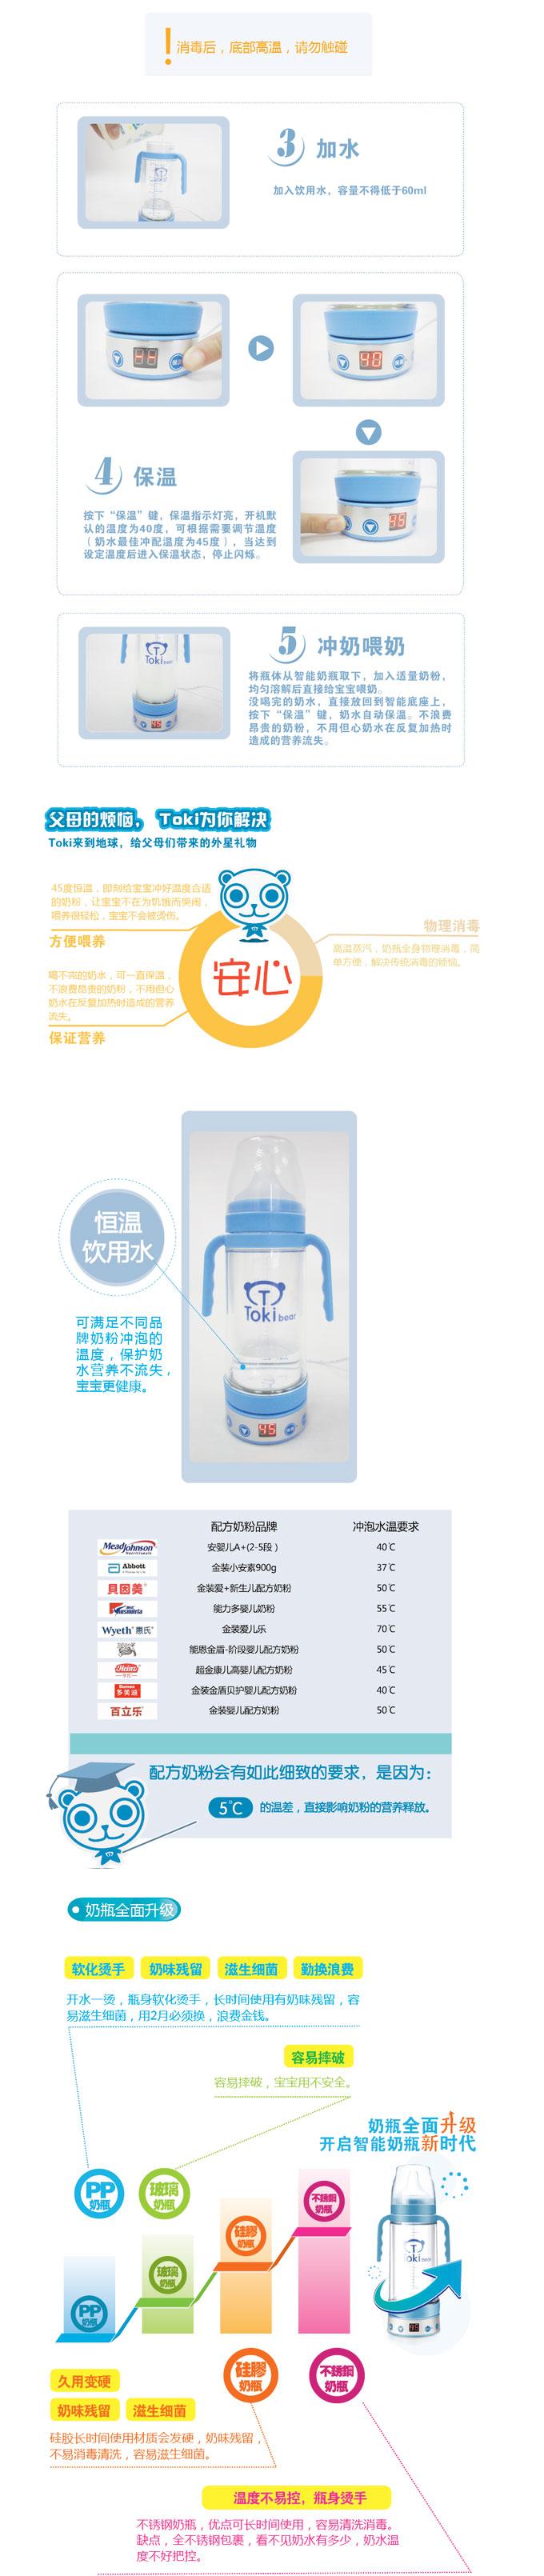 Tokibear 淘气熊智能奶瓶